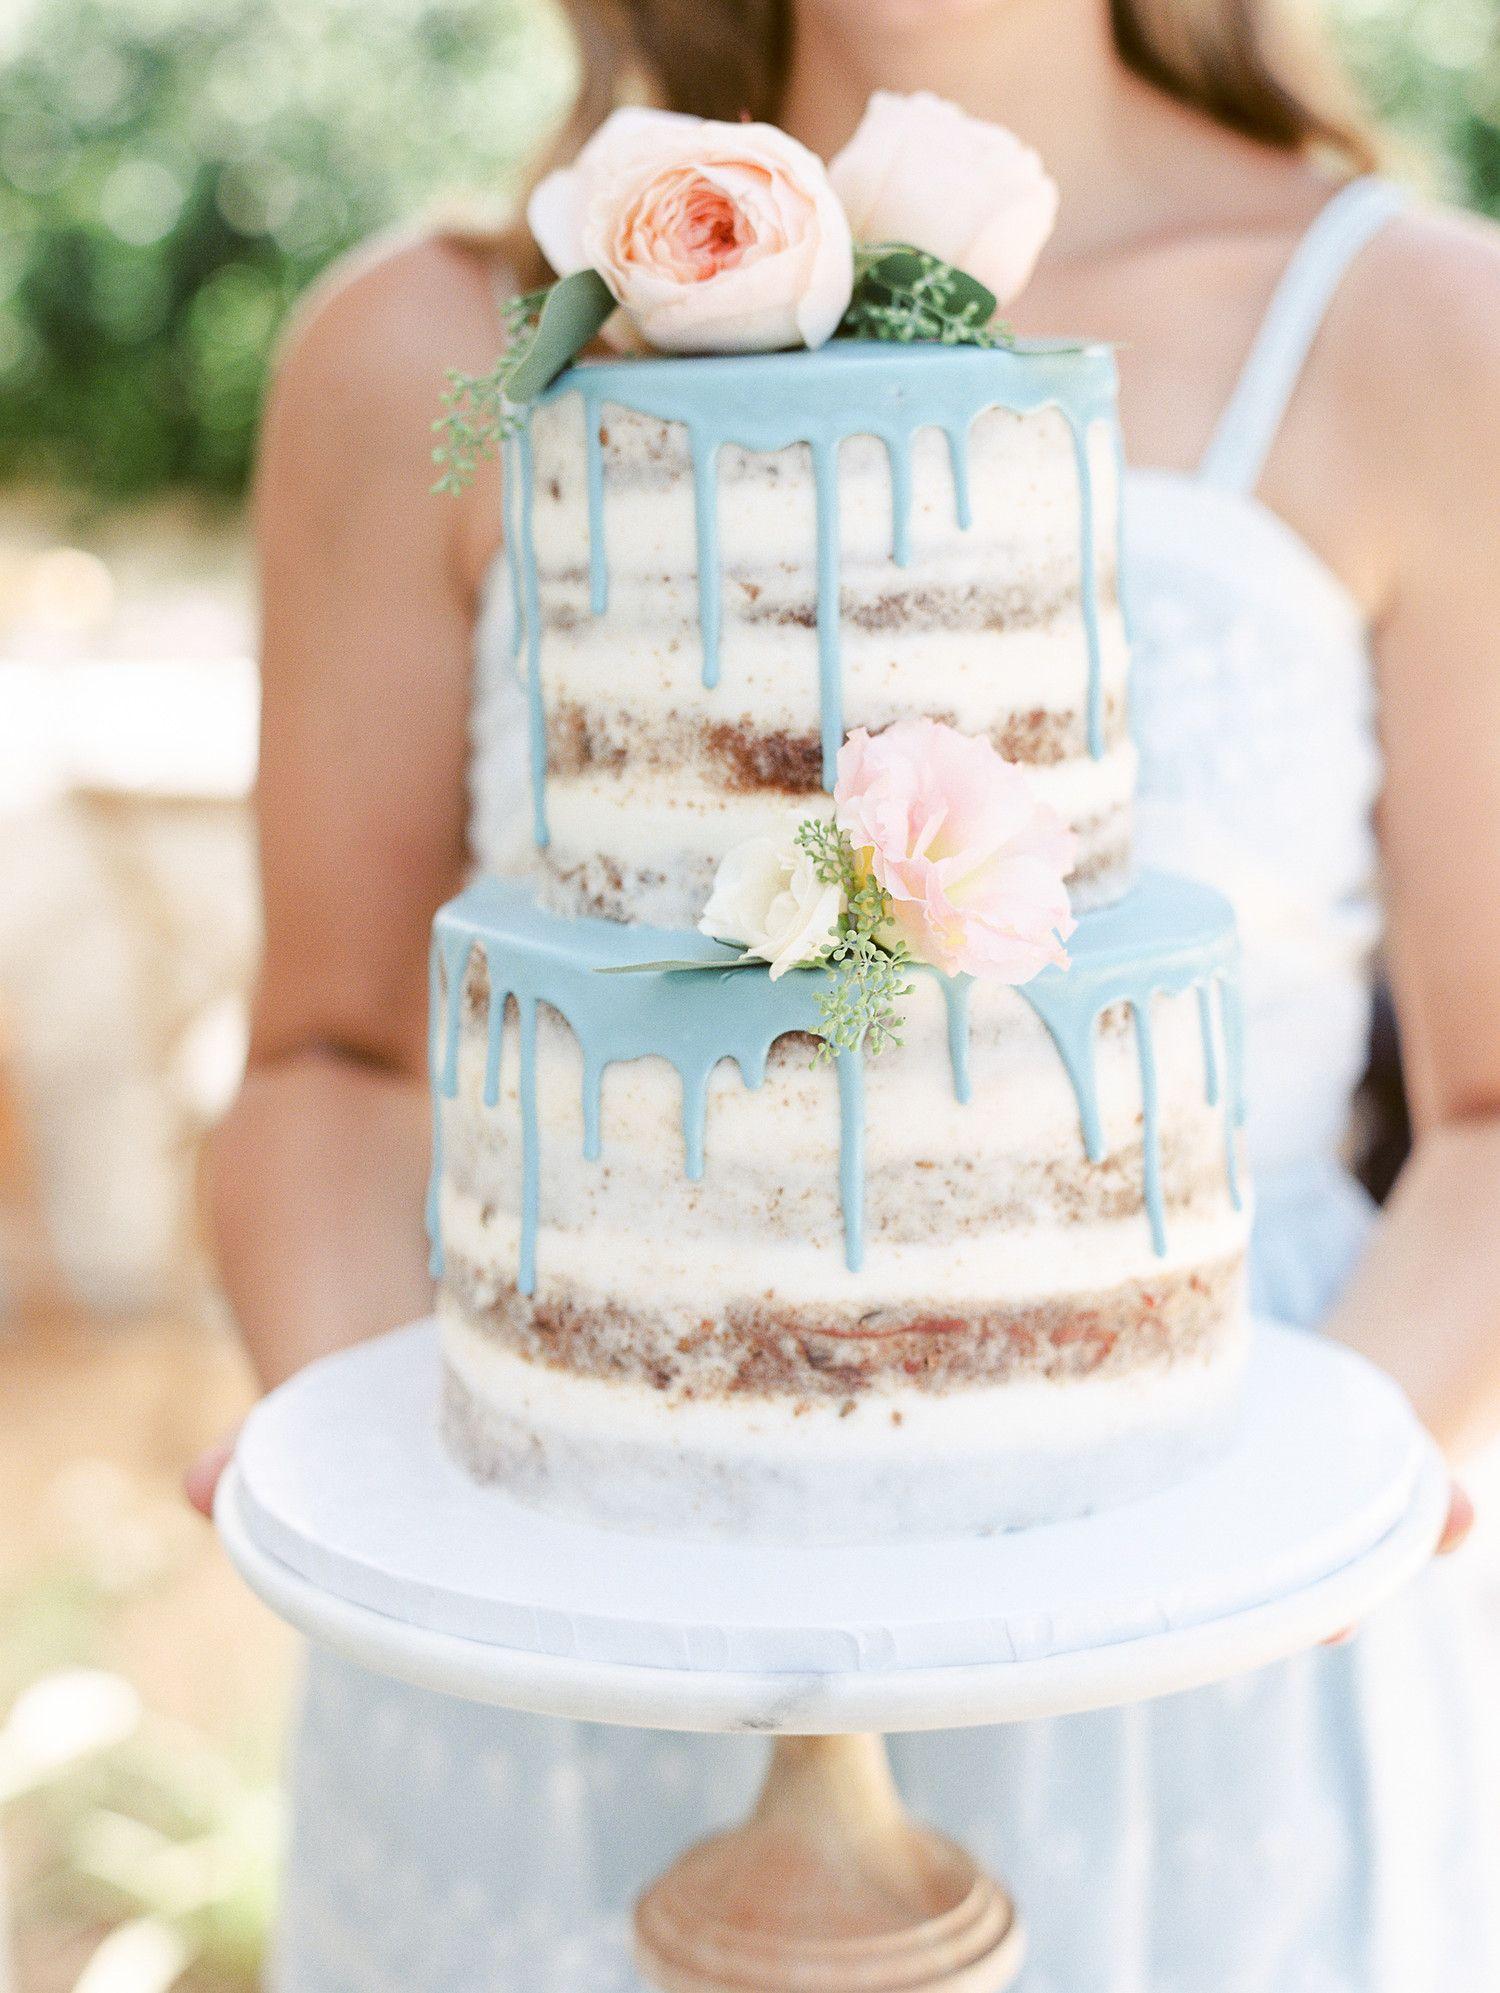 30 Amazing Beach Wedding Cakes | Pinterest | Seaside wedding, Beach ...